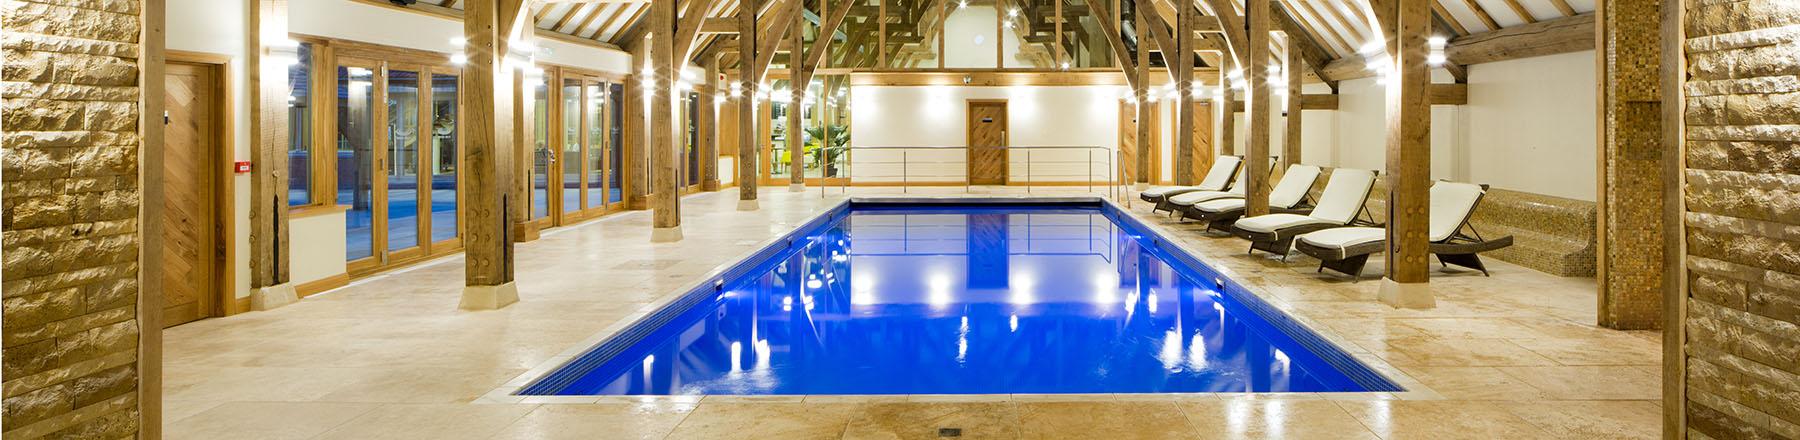 15 Billing Aquadrome Swimming Pool Opening Times Decor23